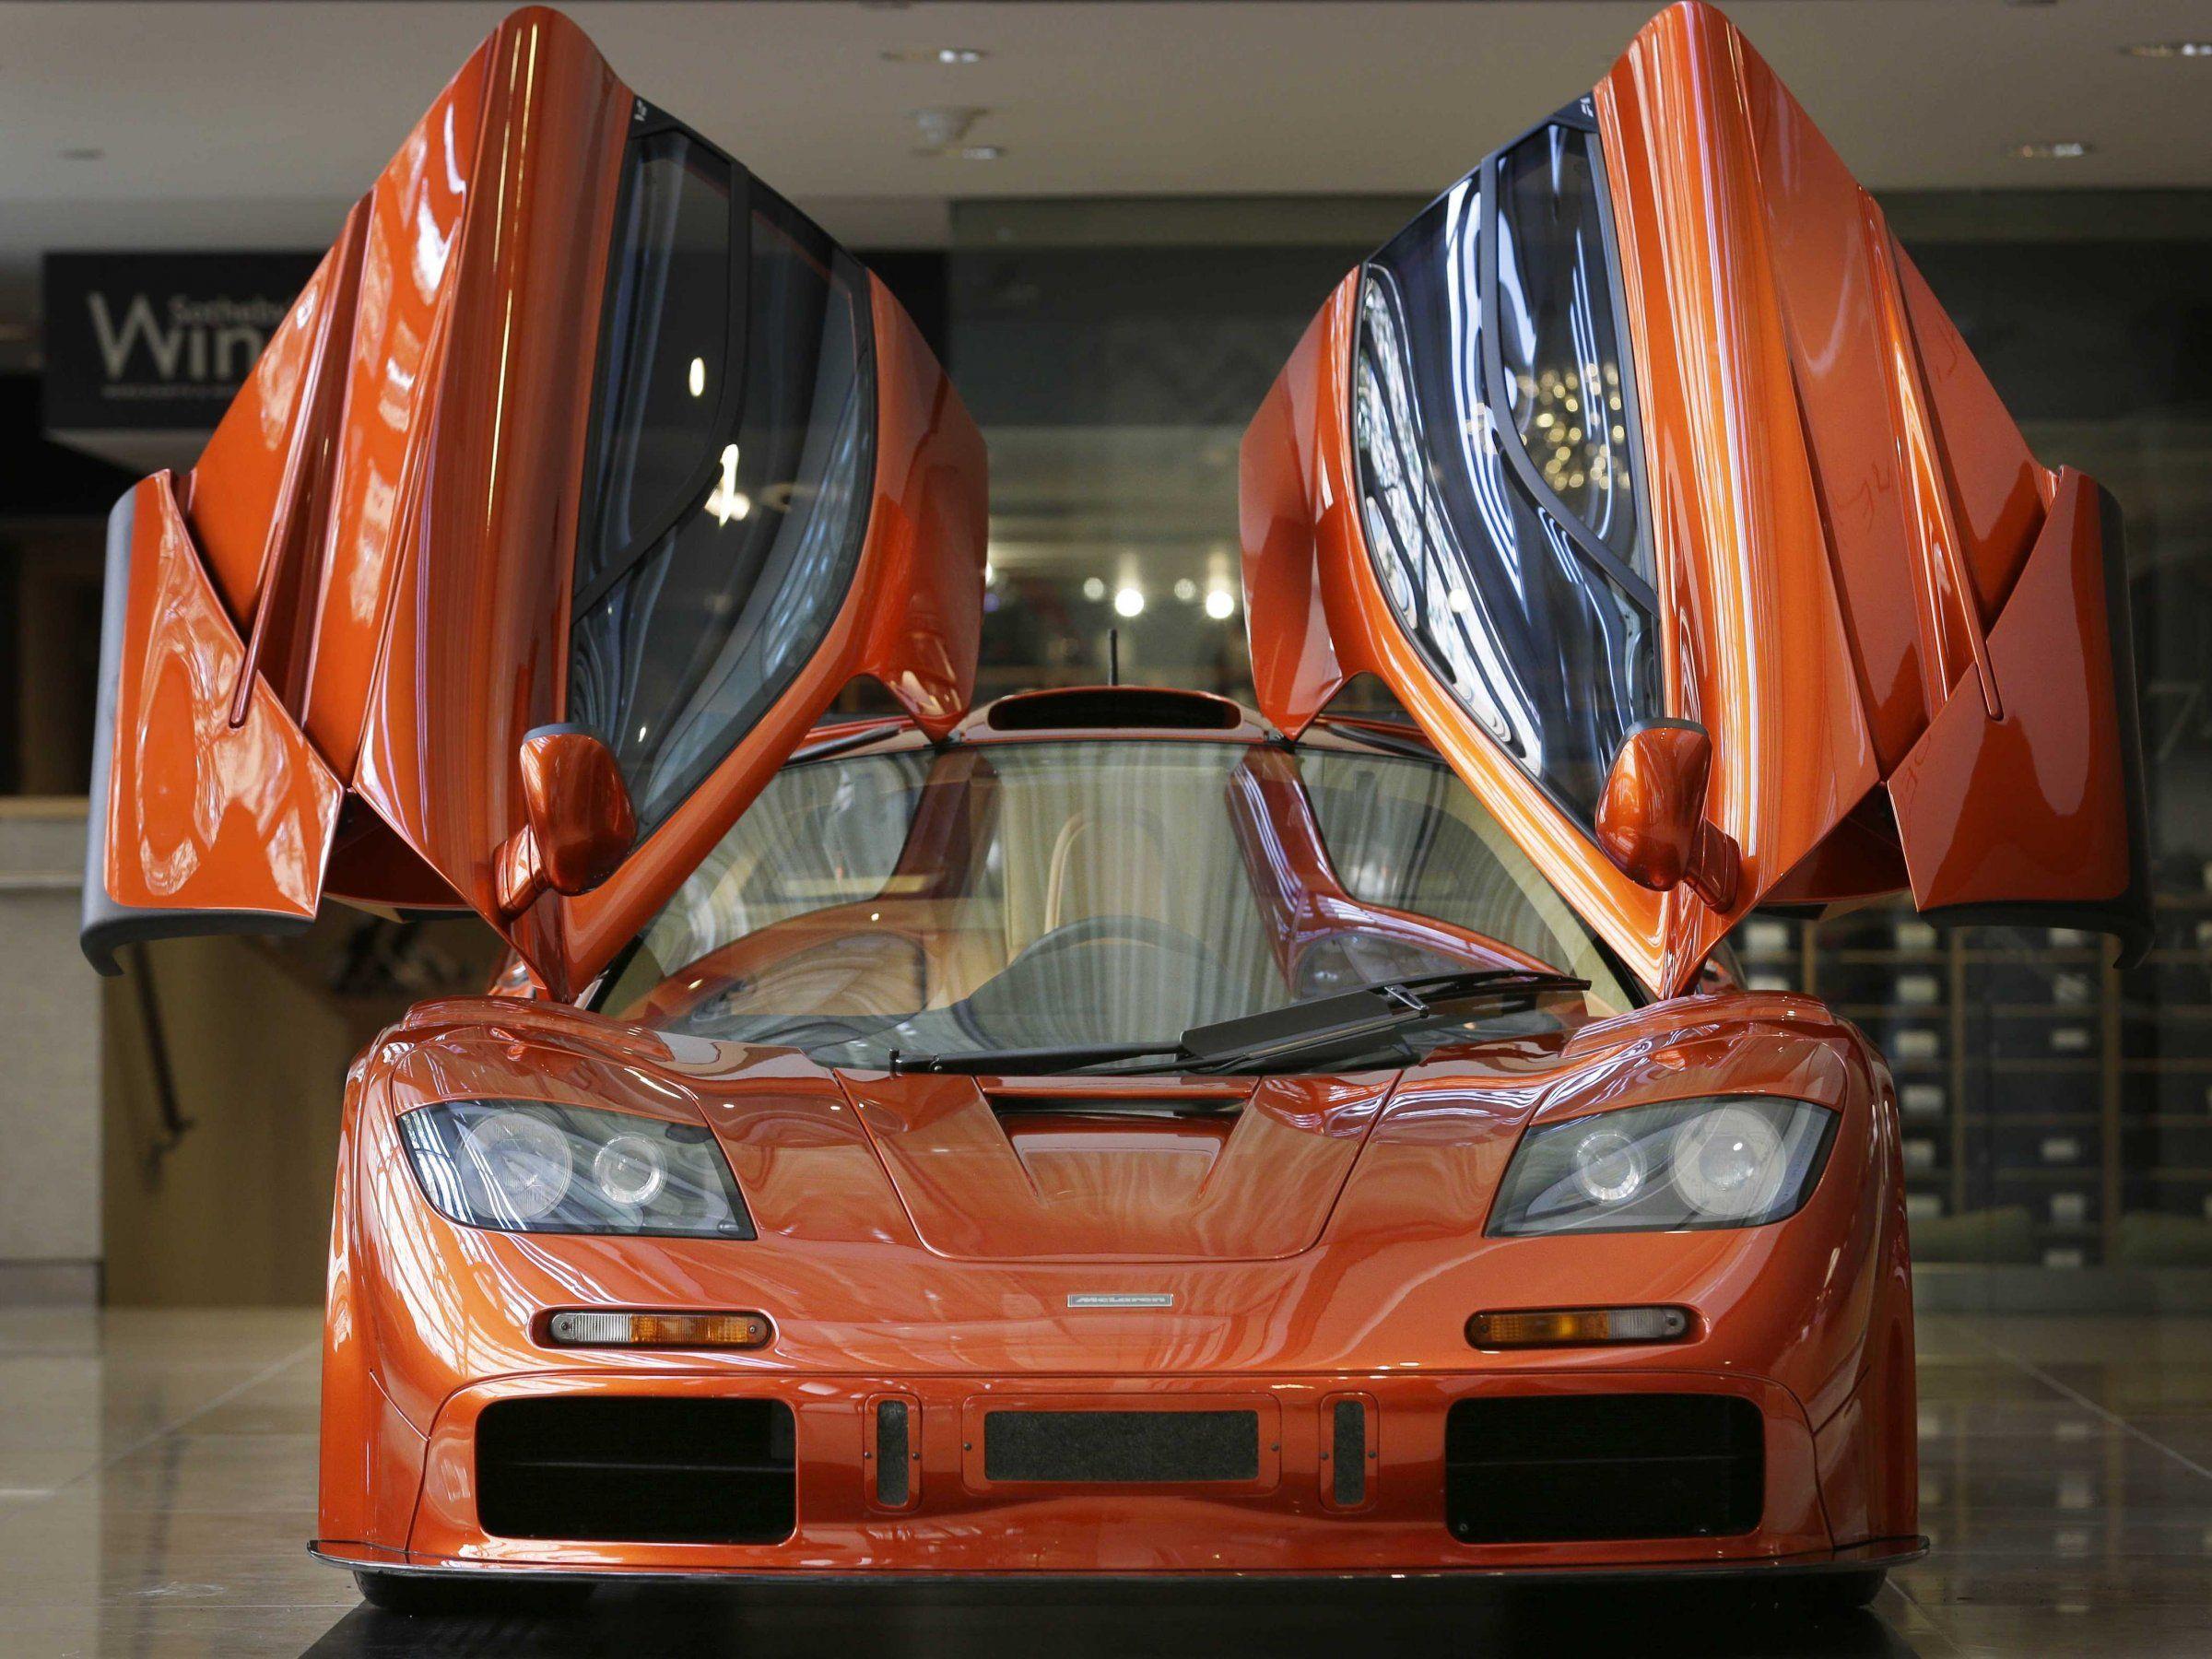 Mclaren F1 Supercar Turns 25 Years Old Photos Super Cars Mclaren F1 Mclaren F1 Lm